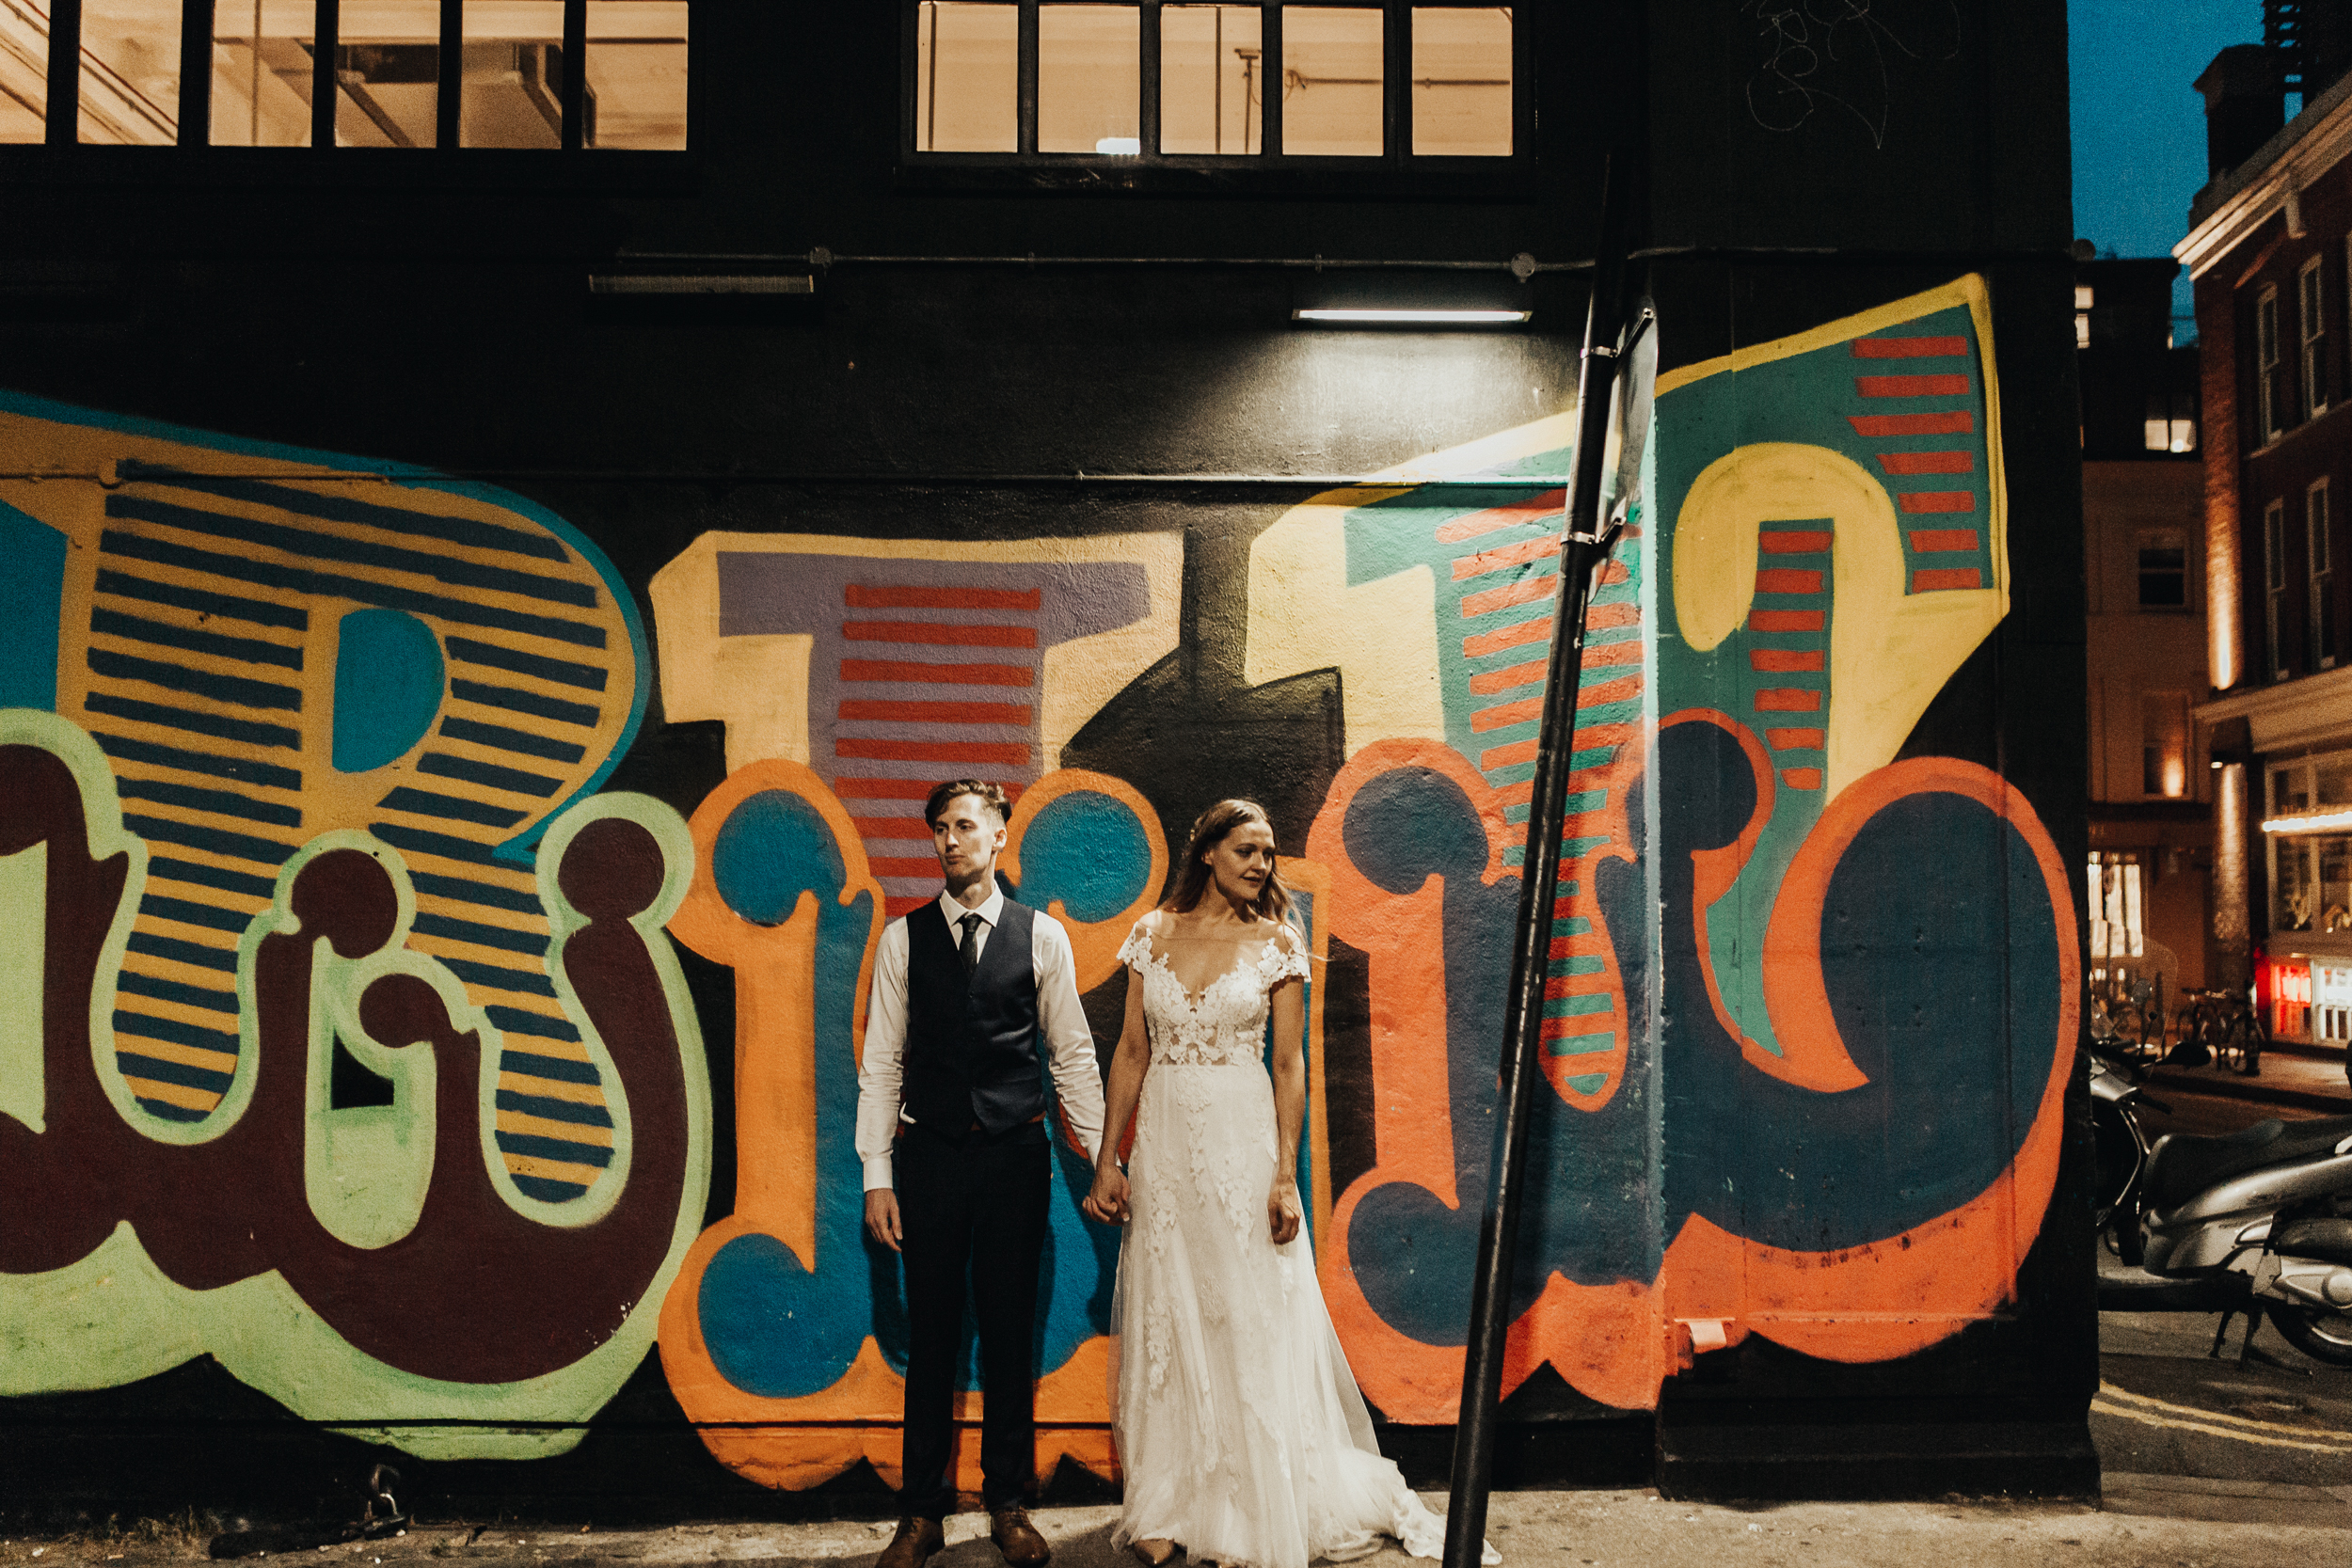 Laura-Benn-The-Asylum-London-The-Ace-Hotel-Wedding-Alternative-Darina-Stoda-Photography-808.jpg